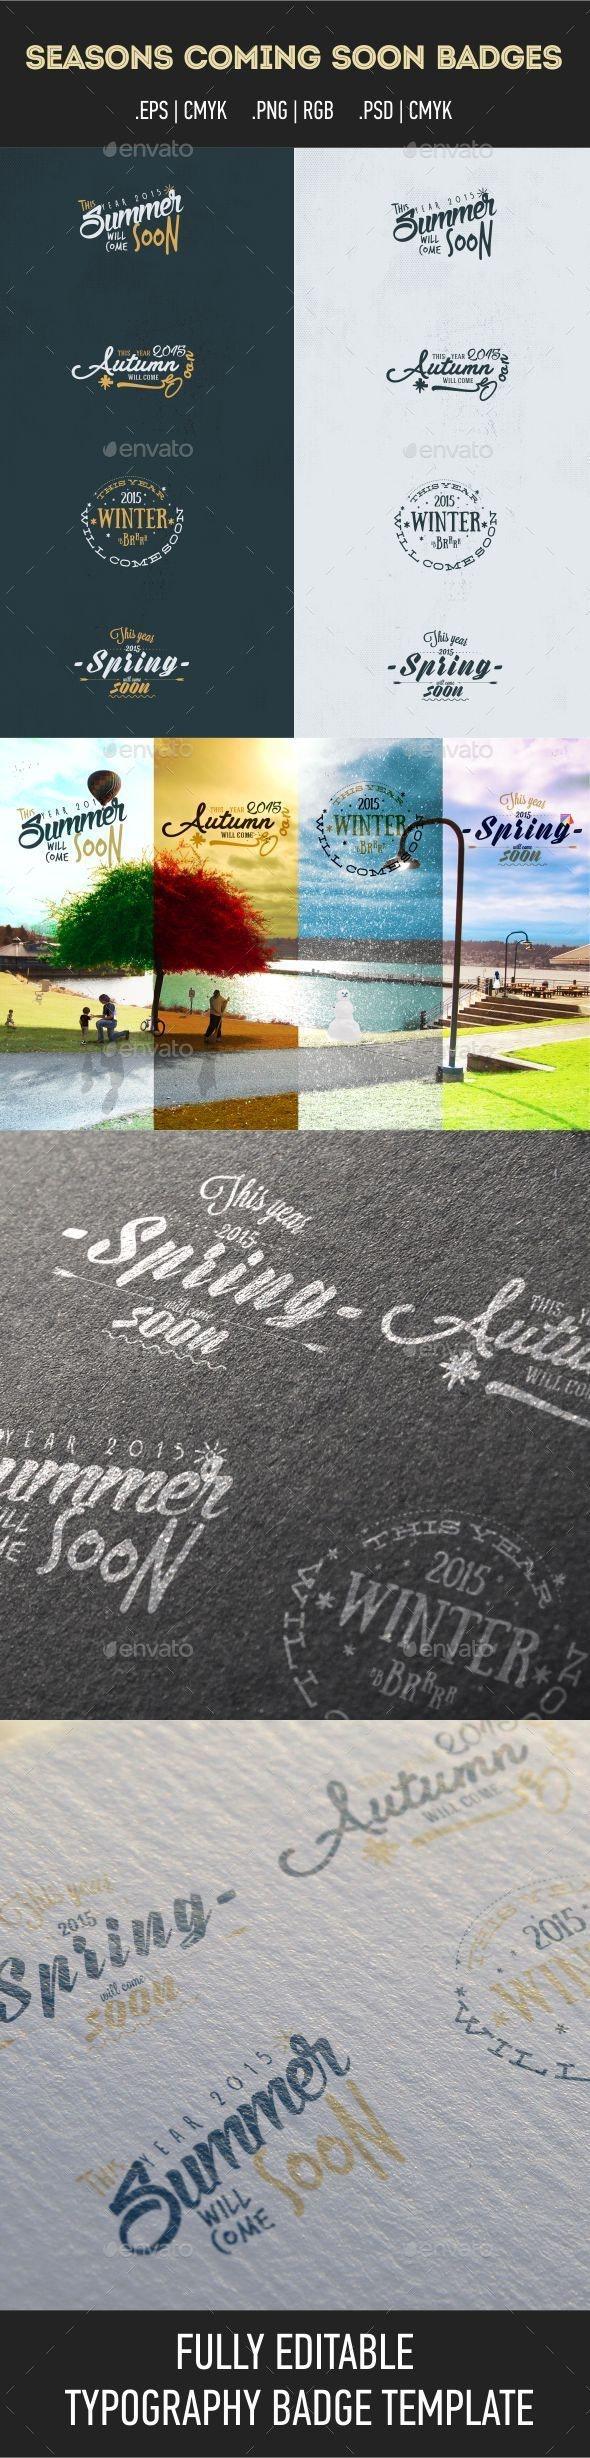 Seasons Coming Soon Badges - Badges & Stickers Web Elements